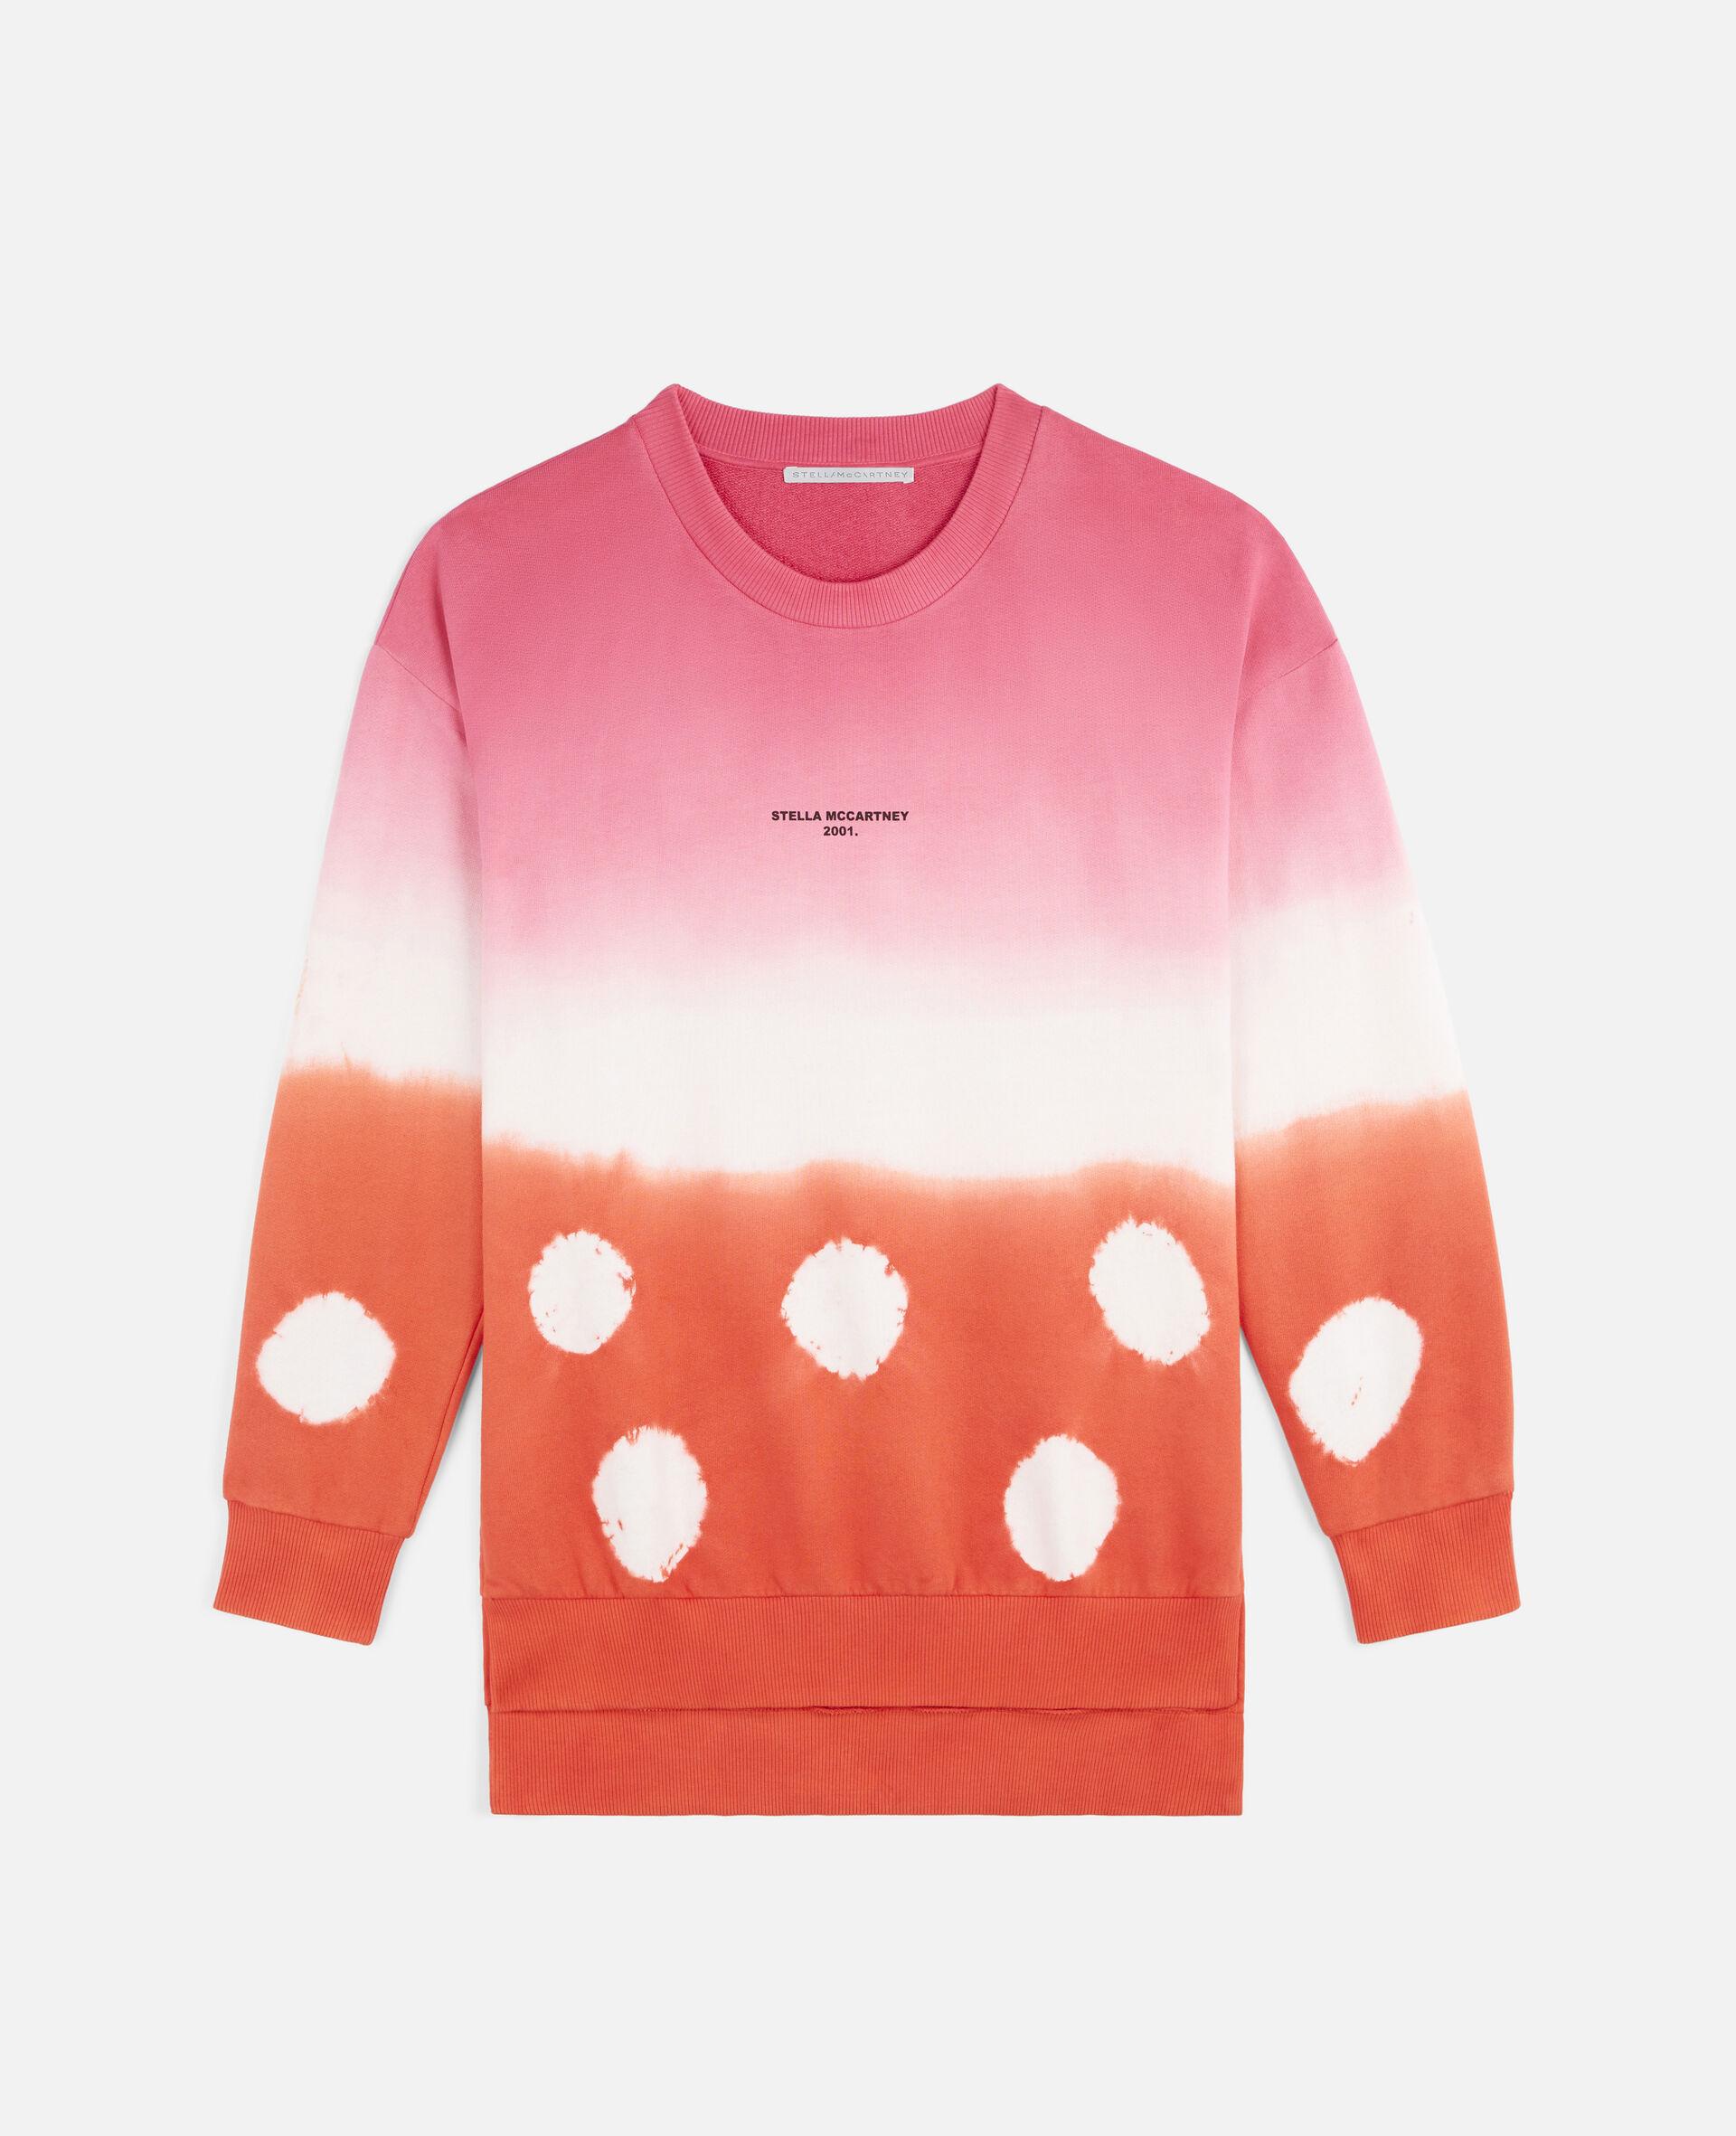 'Stella McCartney 2001.' Tie-Dye Sweatshirt-Multicolour-large image number 0